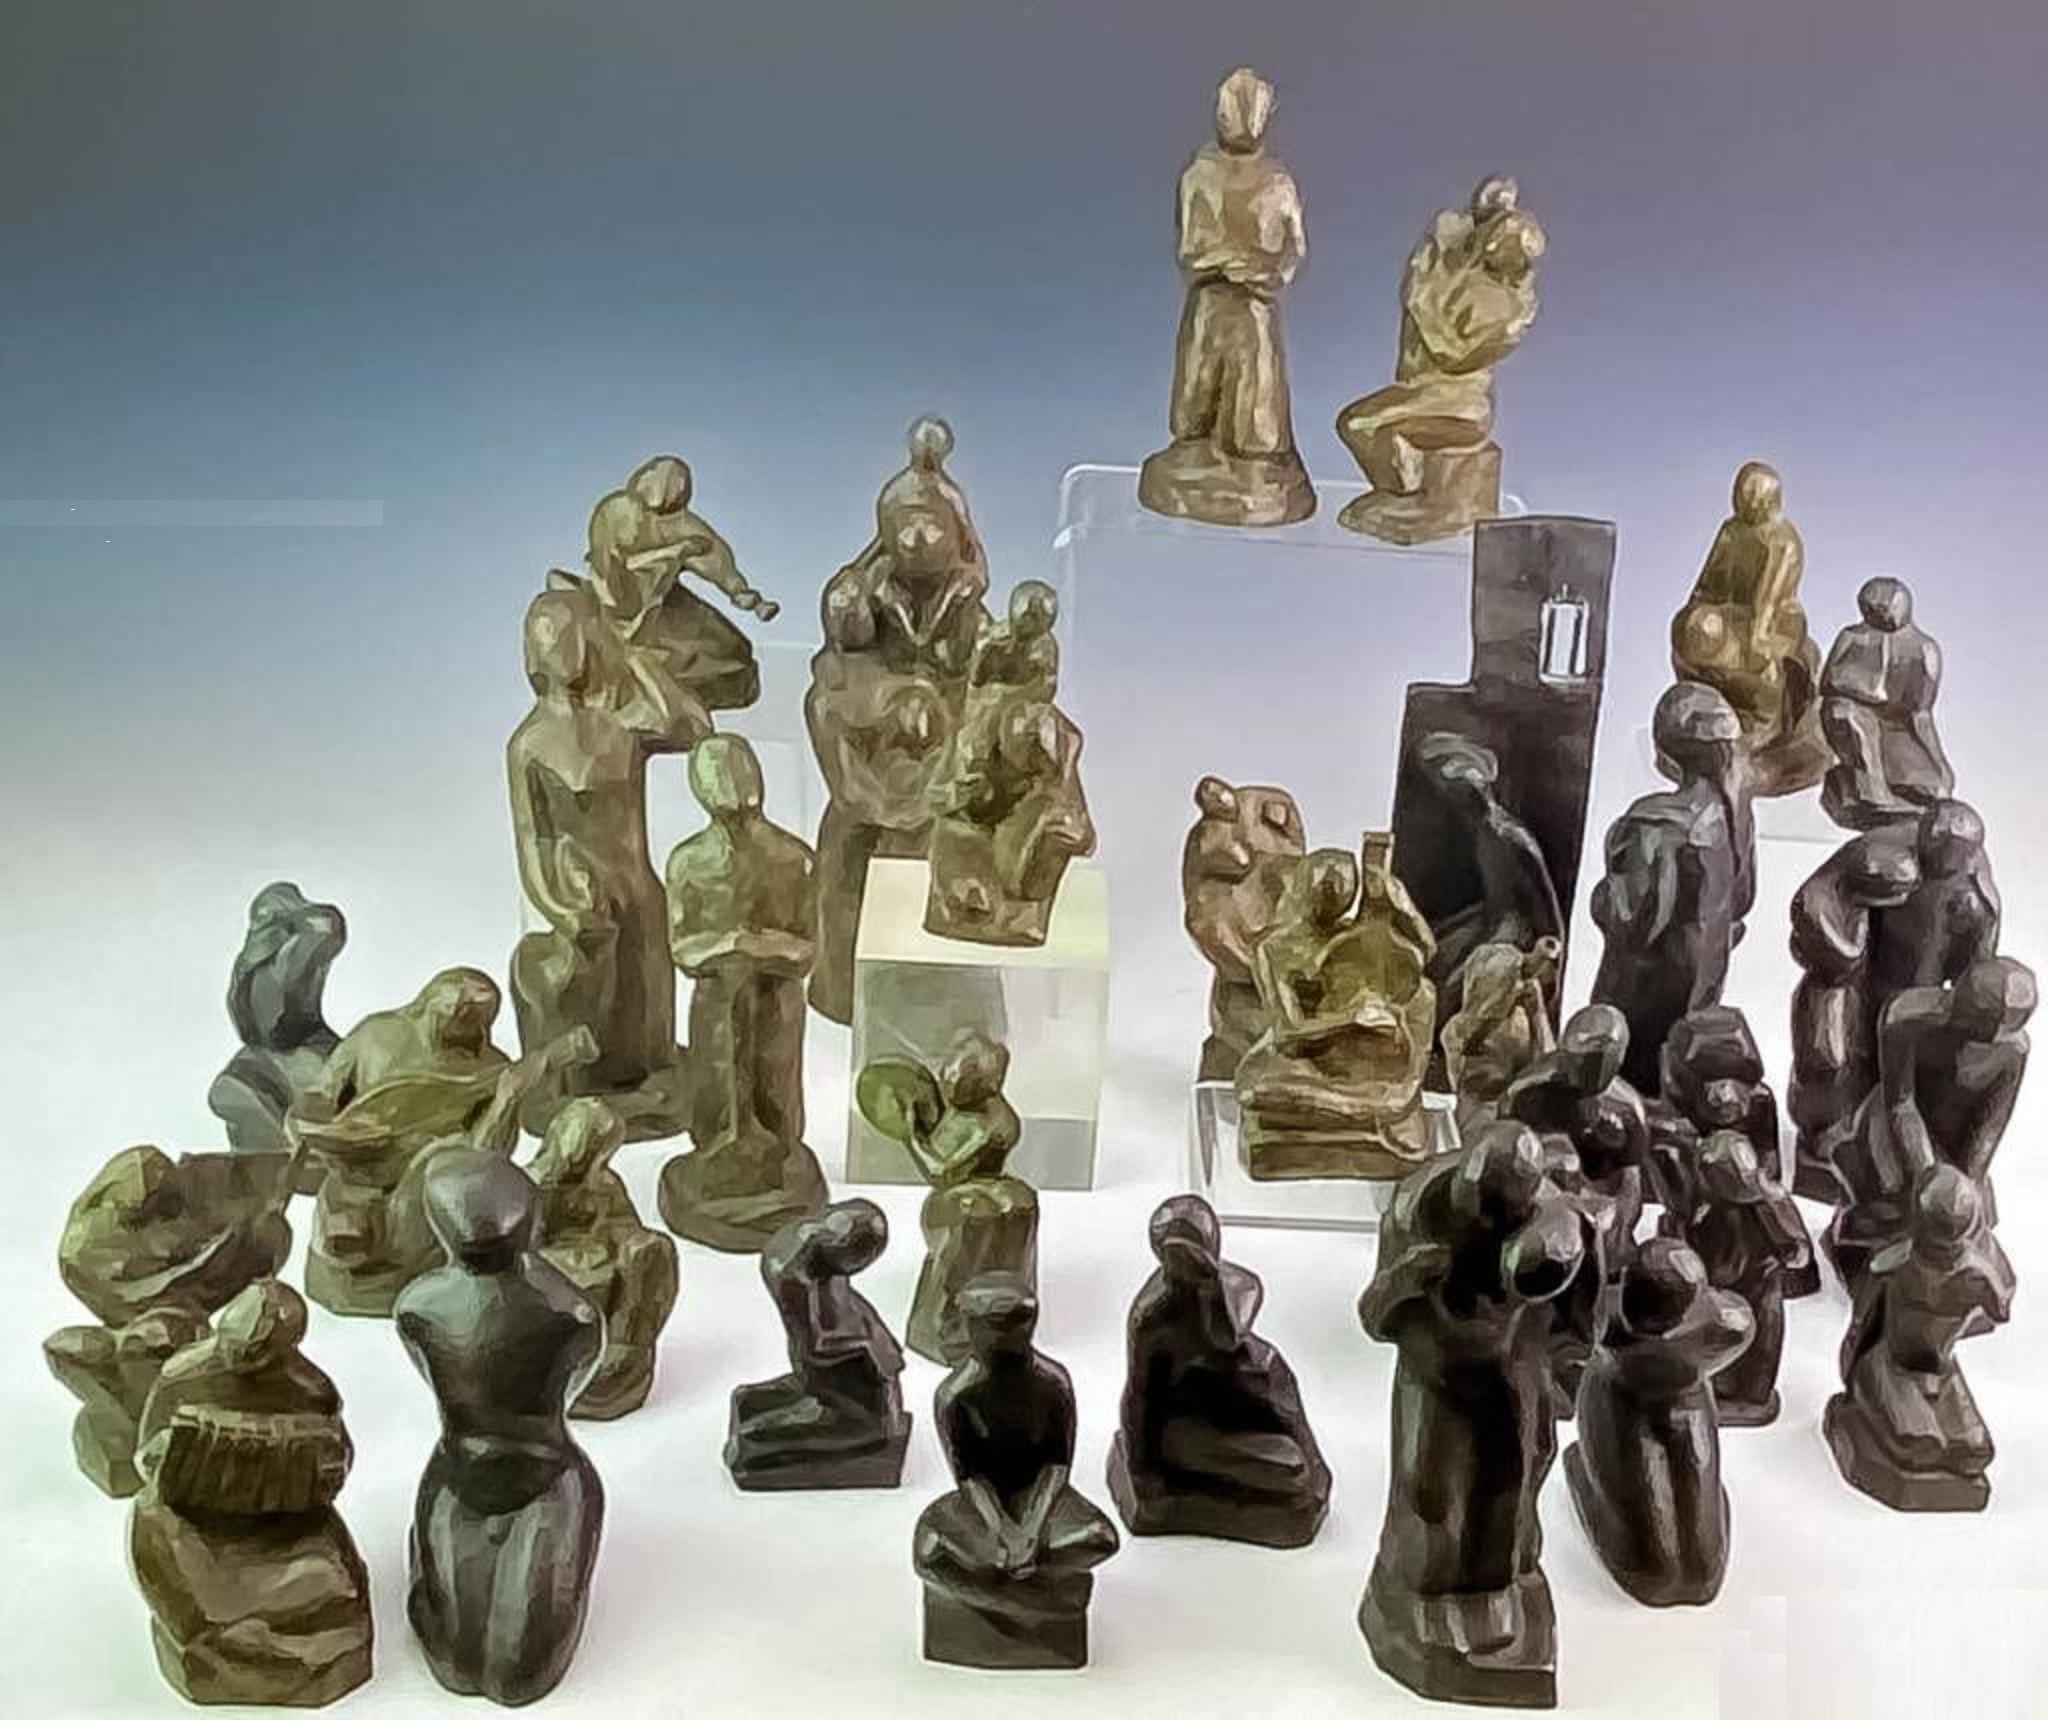 Liberty vs Slavery Van Loen Bronze Abstract Chess Set Modernist Museum Sculpture